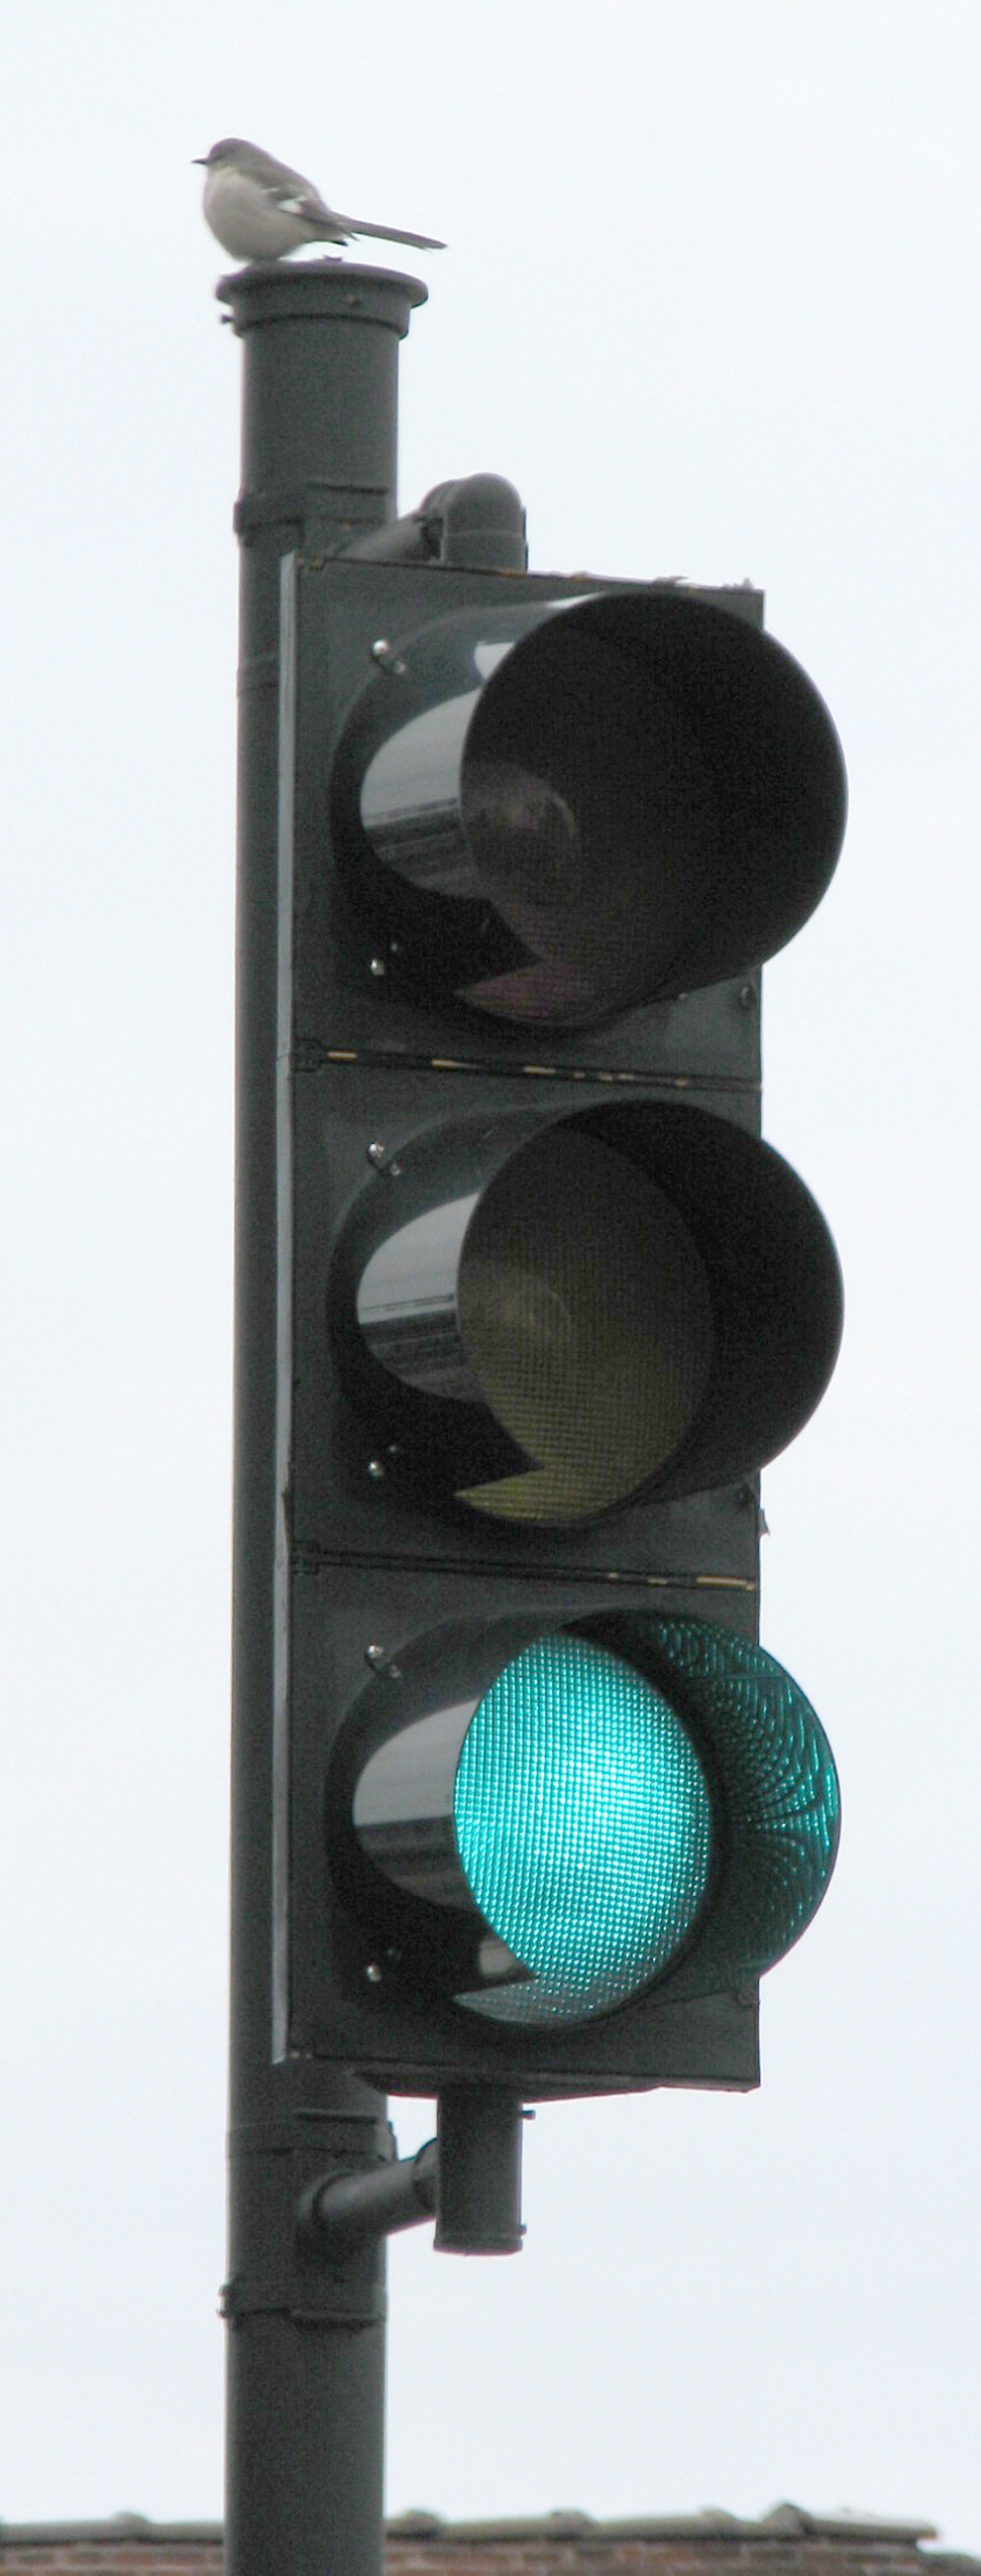 Bird on traffic sign